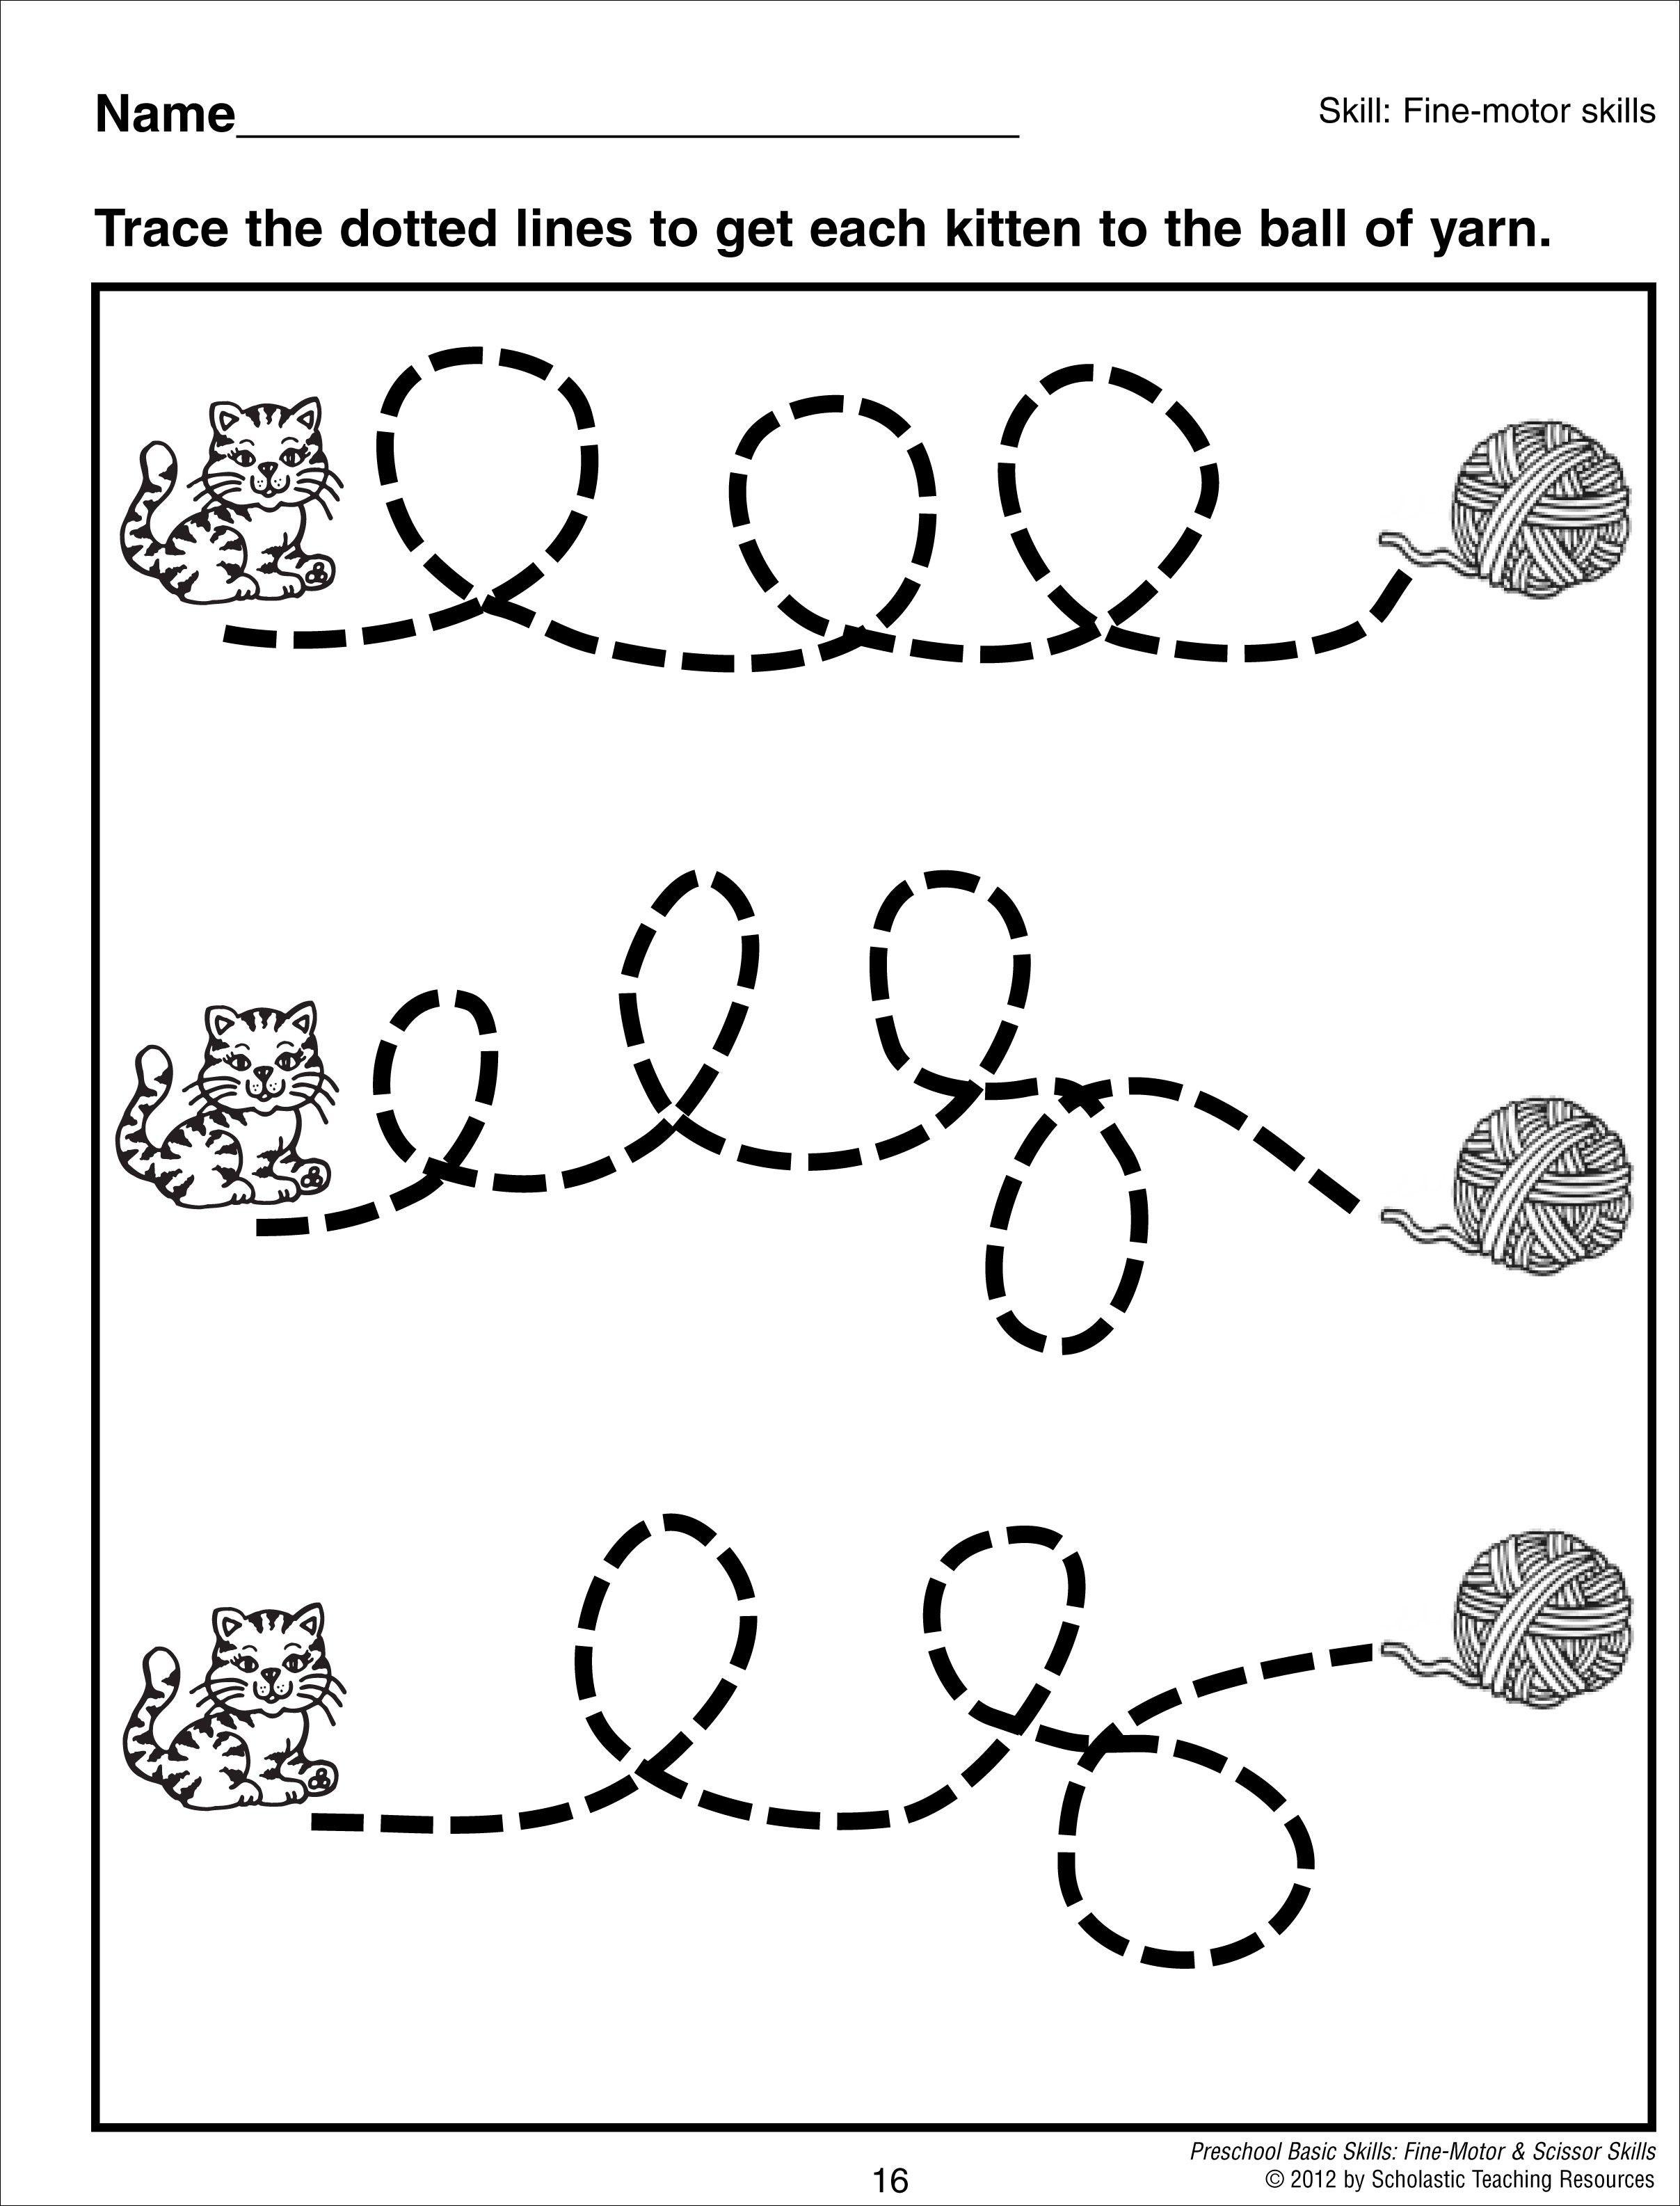 Tracing Curvy Lines Preschool Basic Skills Fine Motor